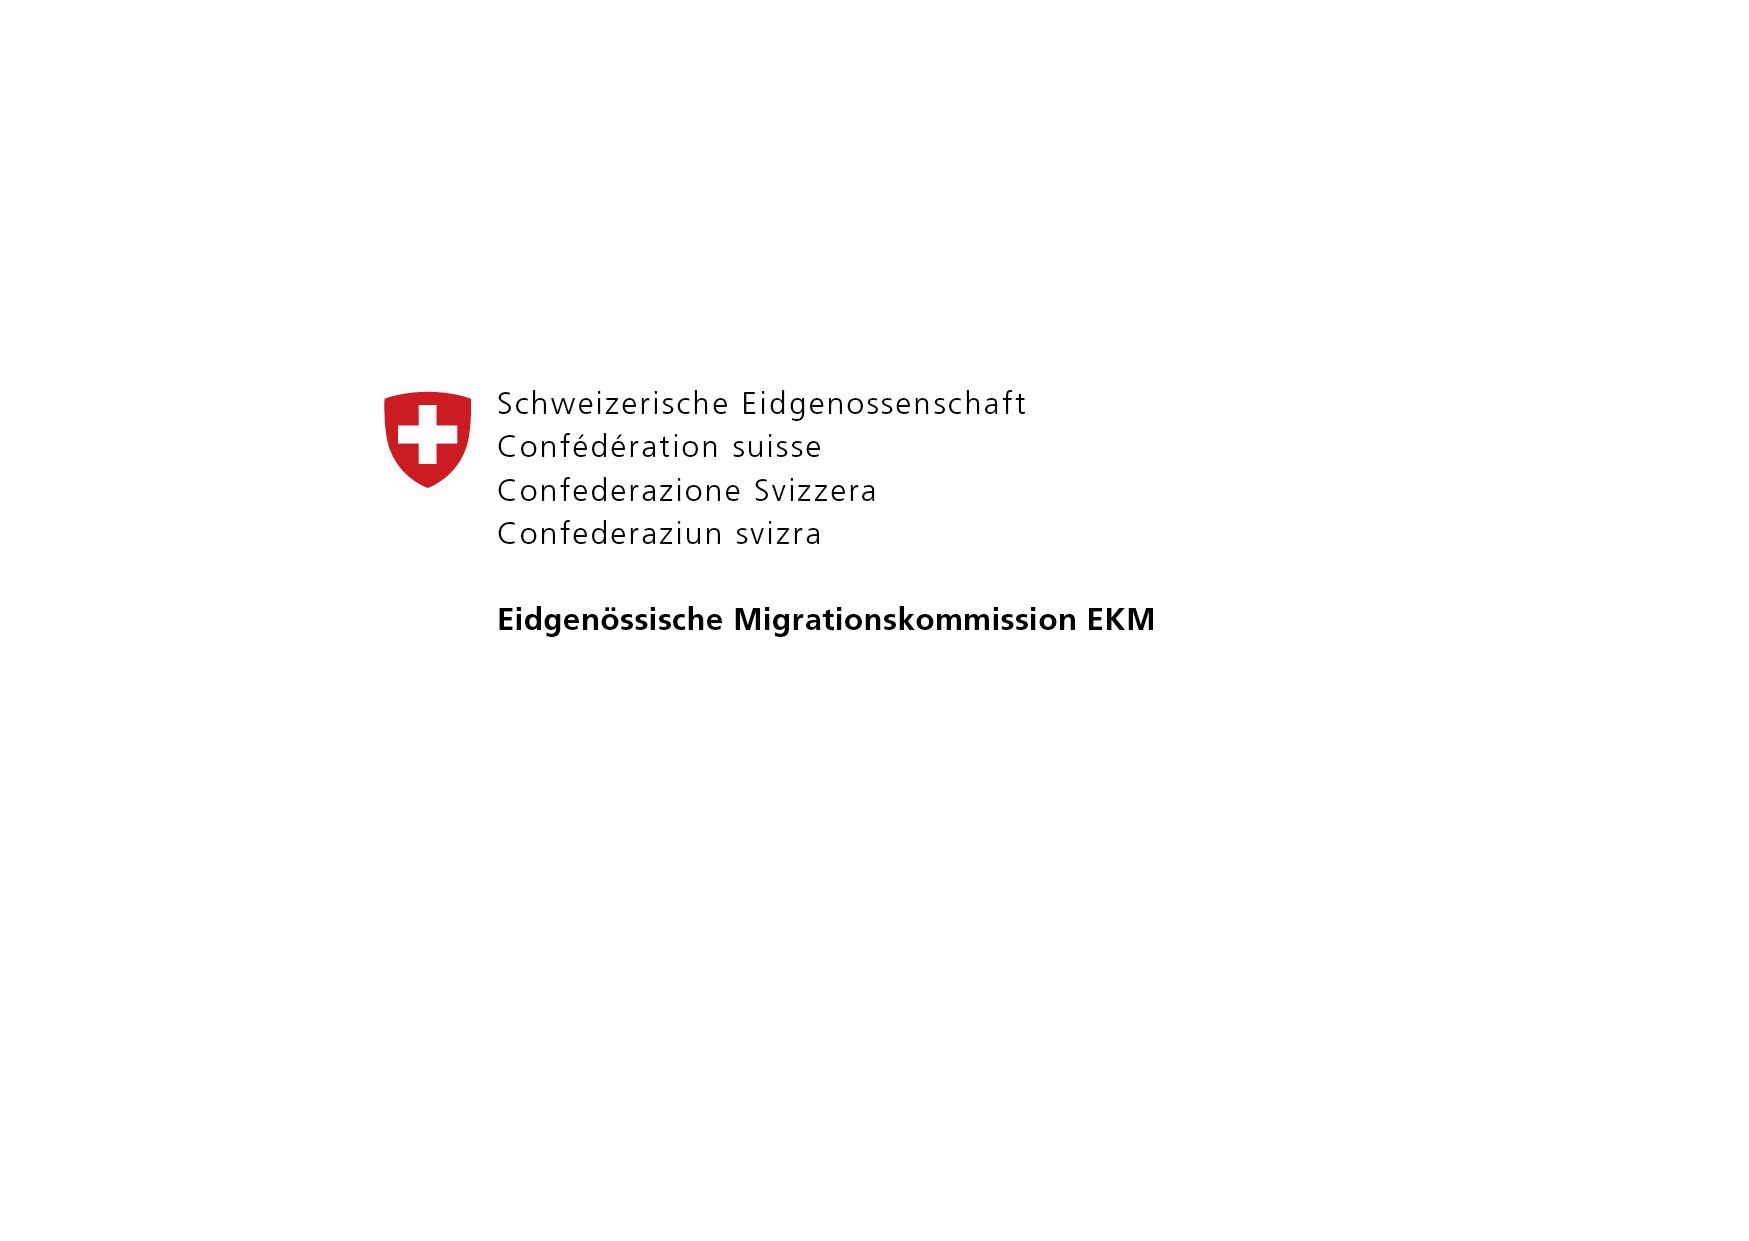 logo2016_ekm_hochD_jpg